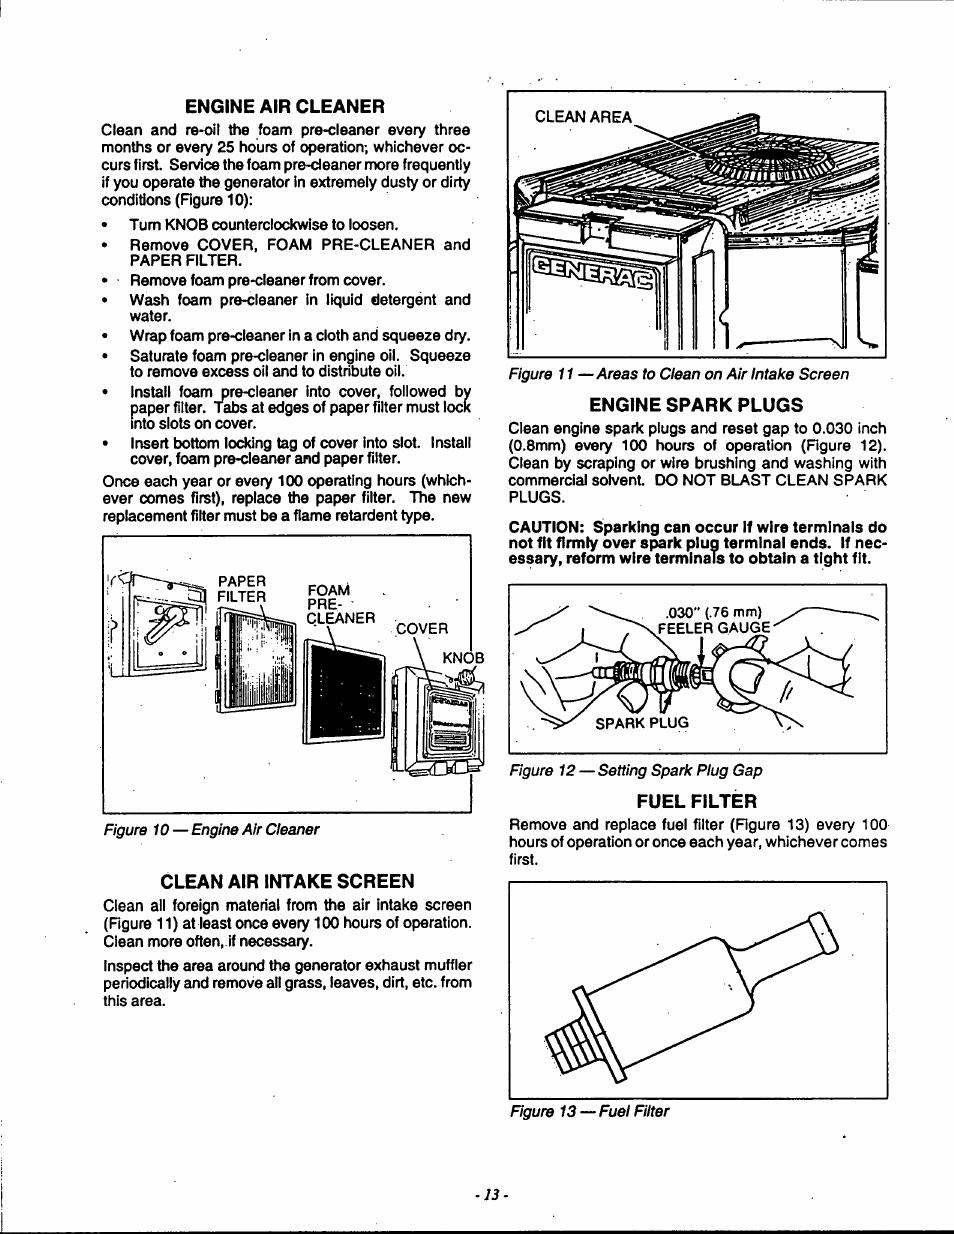 generac power systems 9592 3 user manual page 15 36 original rh manualsdir com generac power systems owner's manual Generac Wiring Manuals